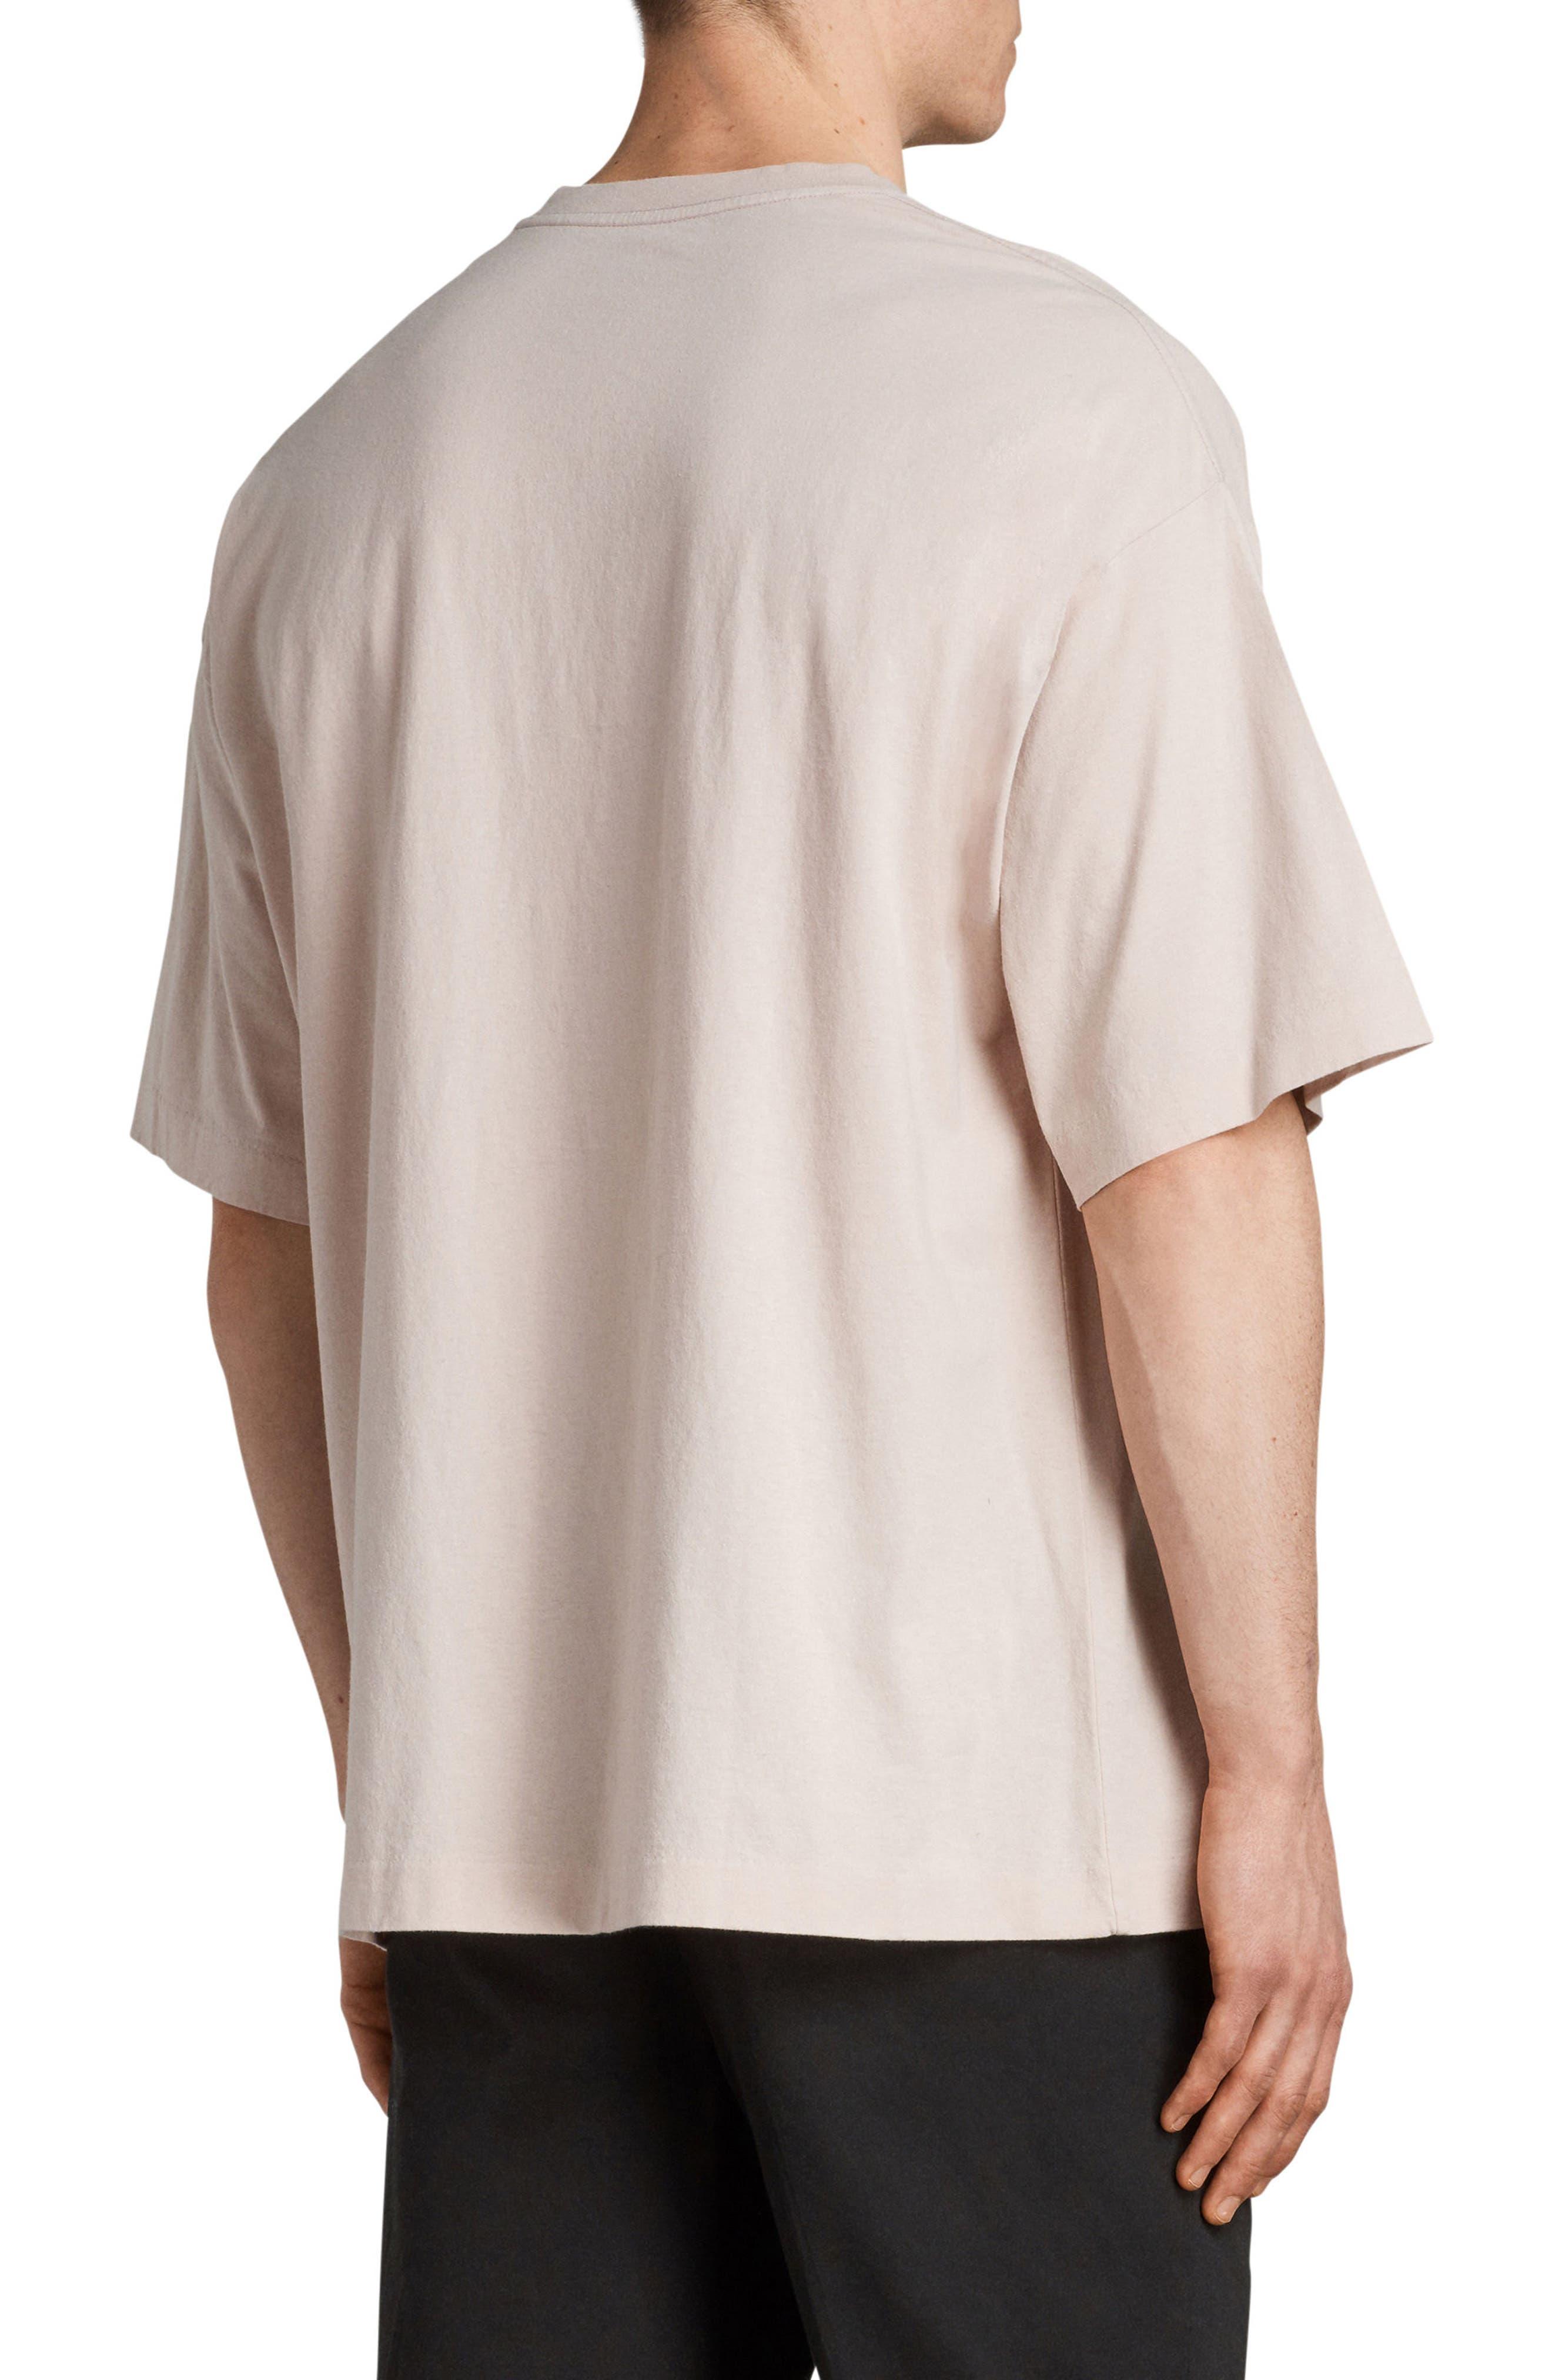 Atnom Crewneck T-Shirt,                             Alternate thumbnail 2, color,                             River Pink